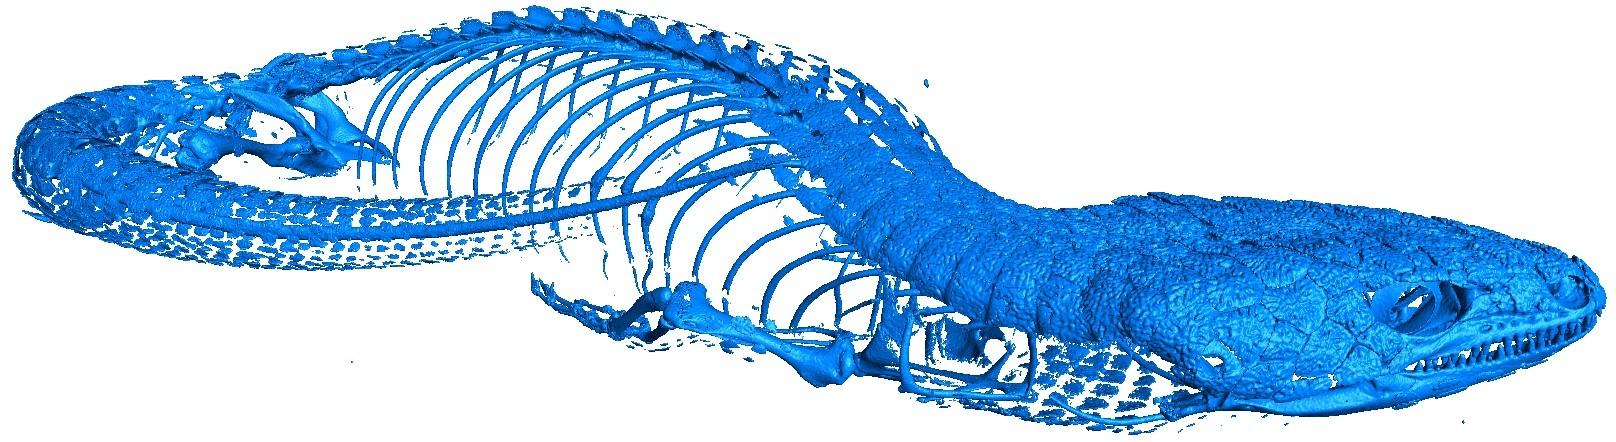 CT scan of alligator lizard